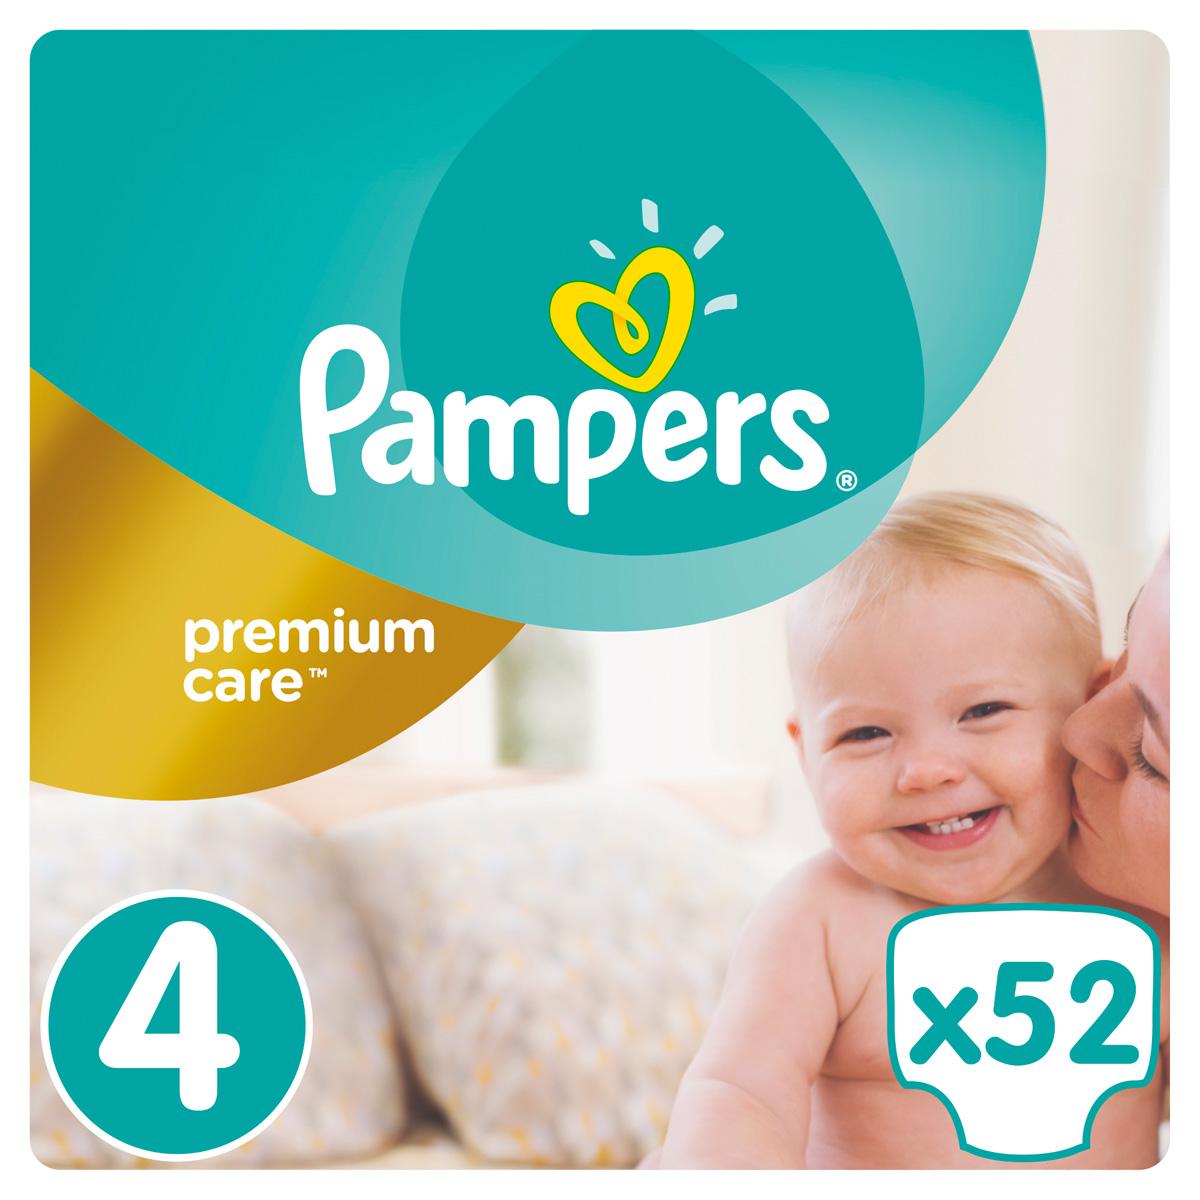 Pampers Premium Care Подгузники 4, 7-18 кг, 52 шт подгузники детские pampers подгузники pampers premium care 3 6 кг 96 шт